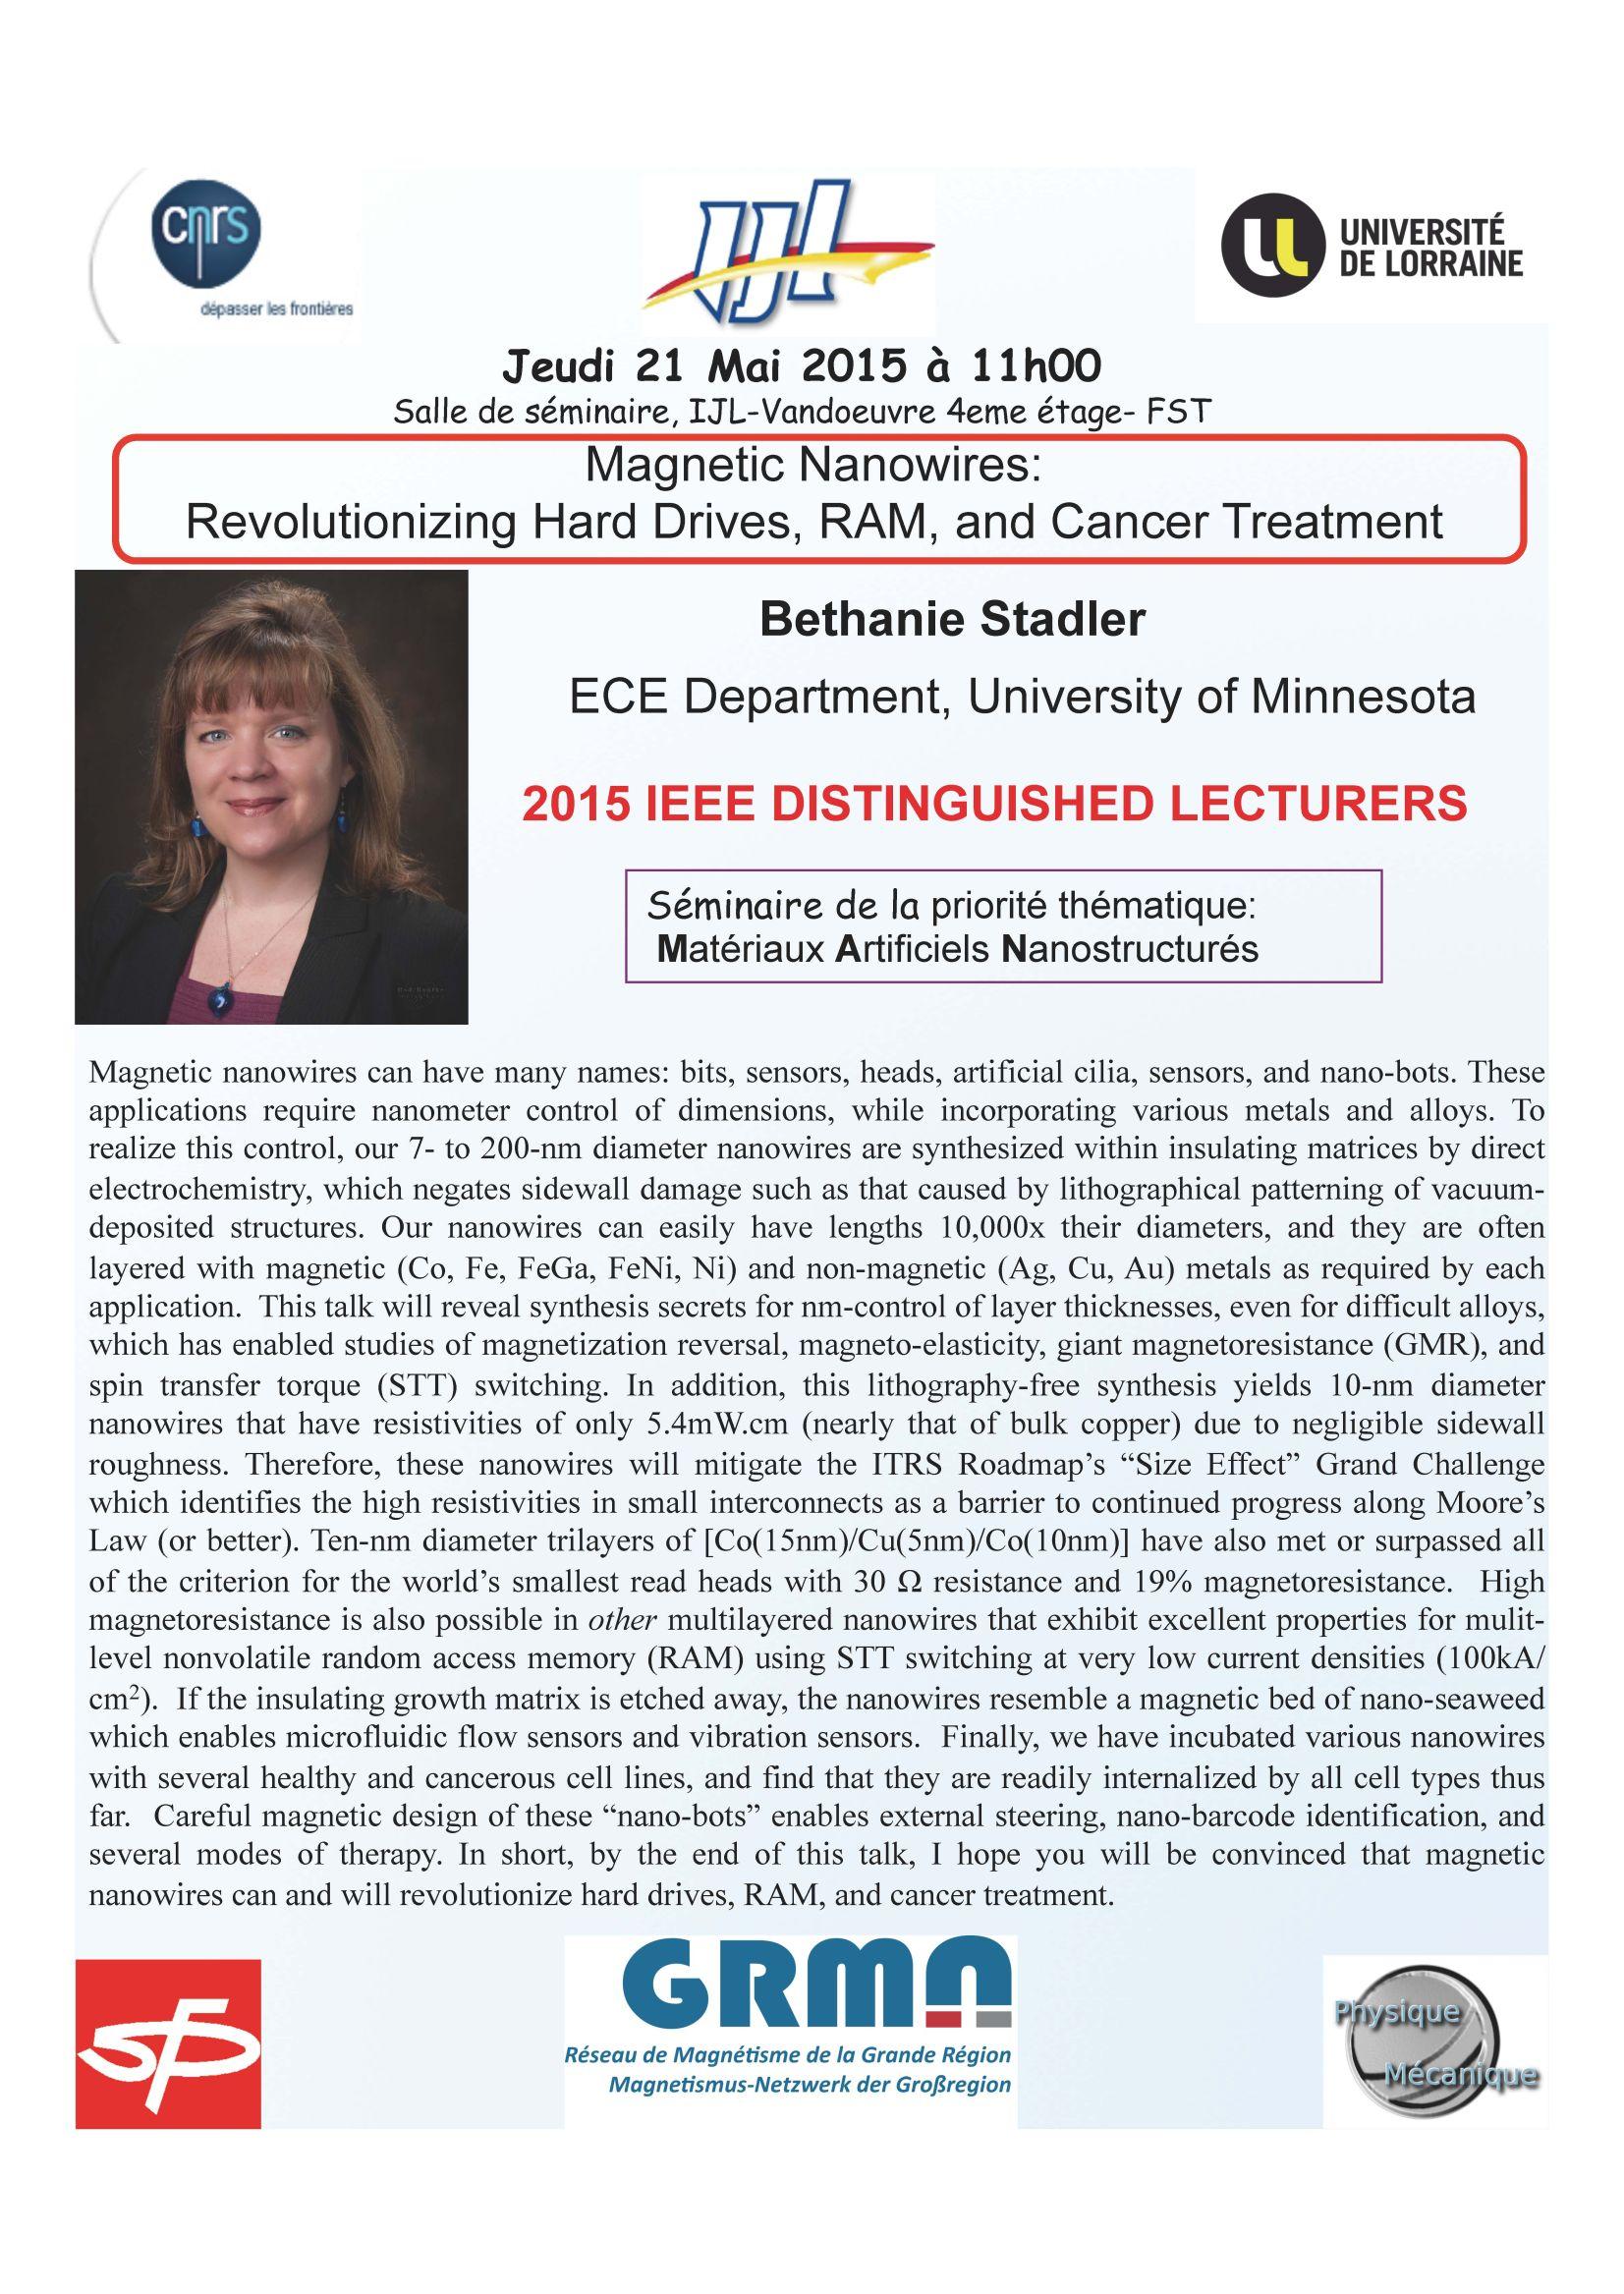 Seminaire Bethanie Stadler 21 mai 2015